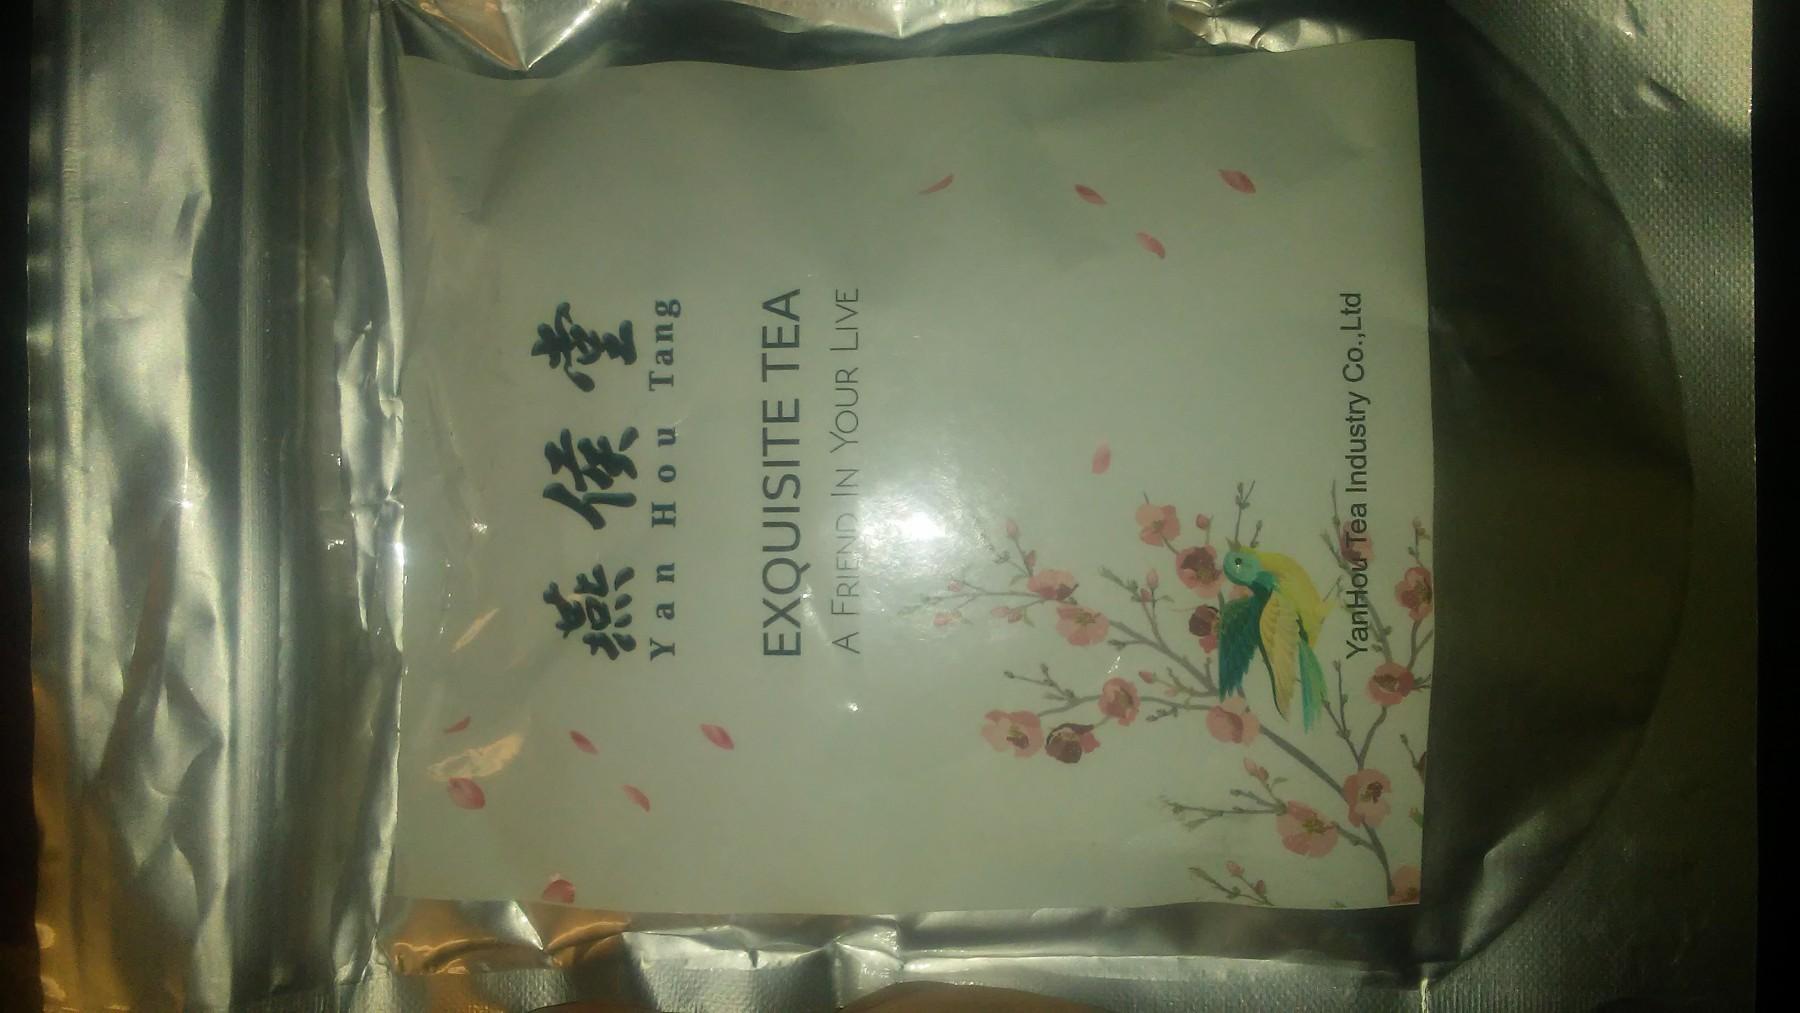 Excellent tasting tea